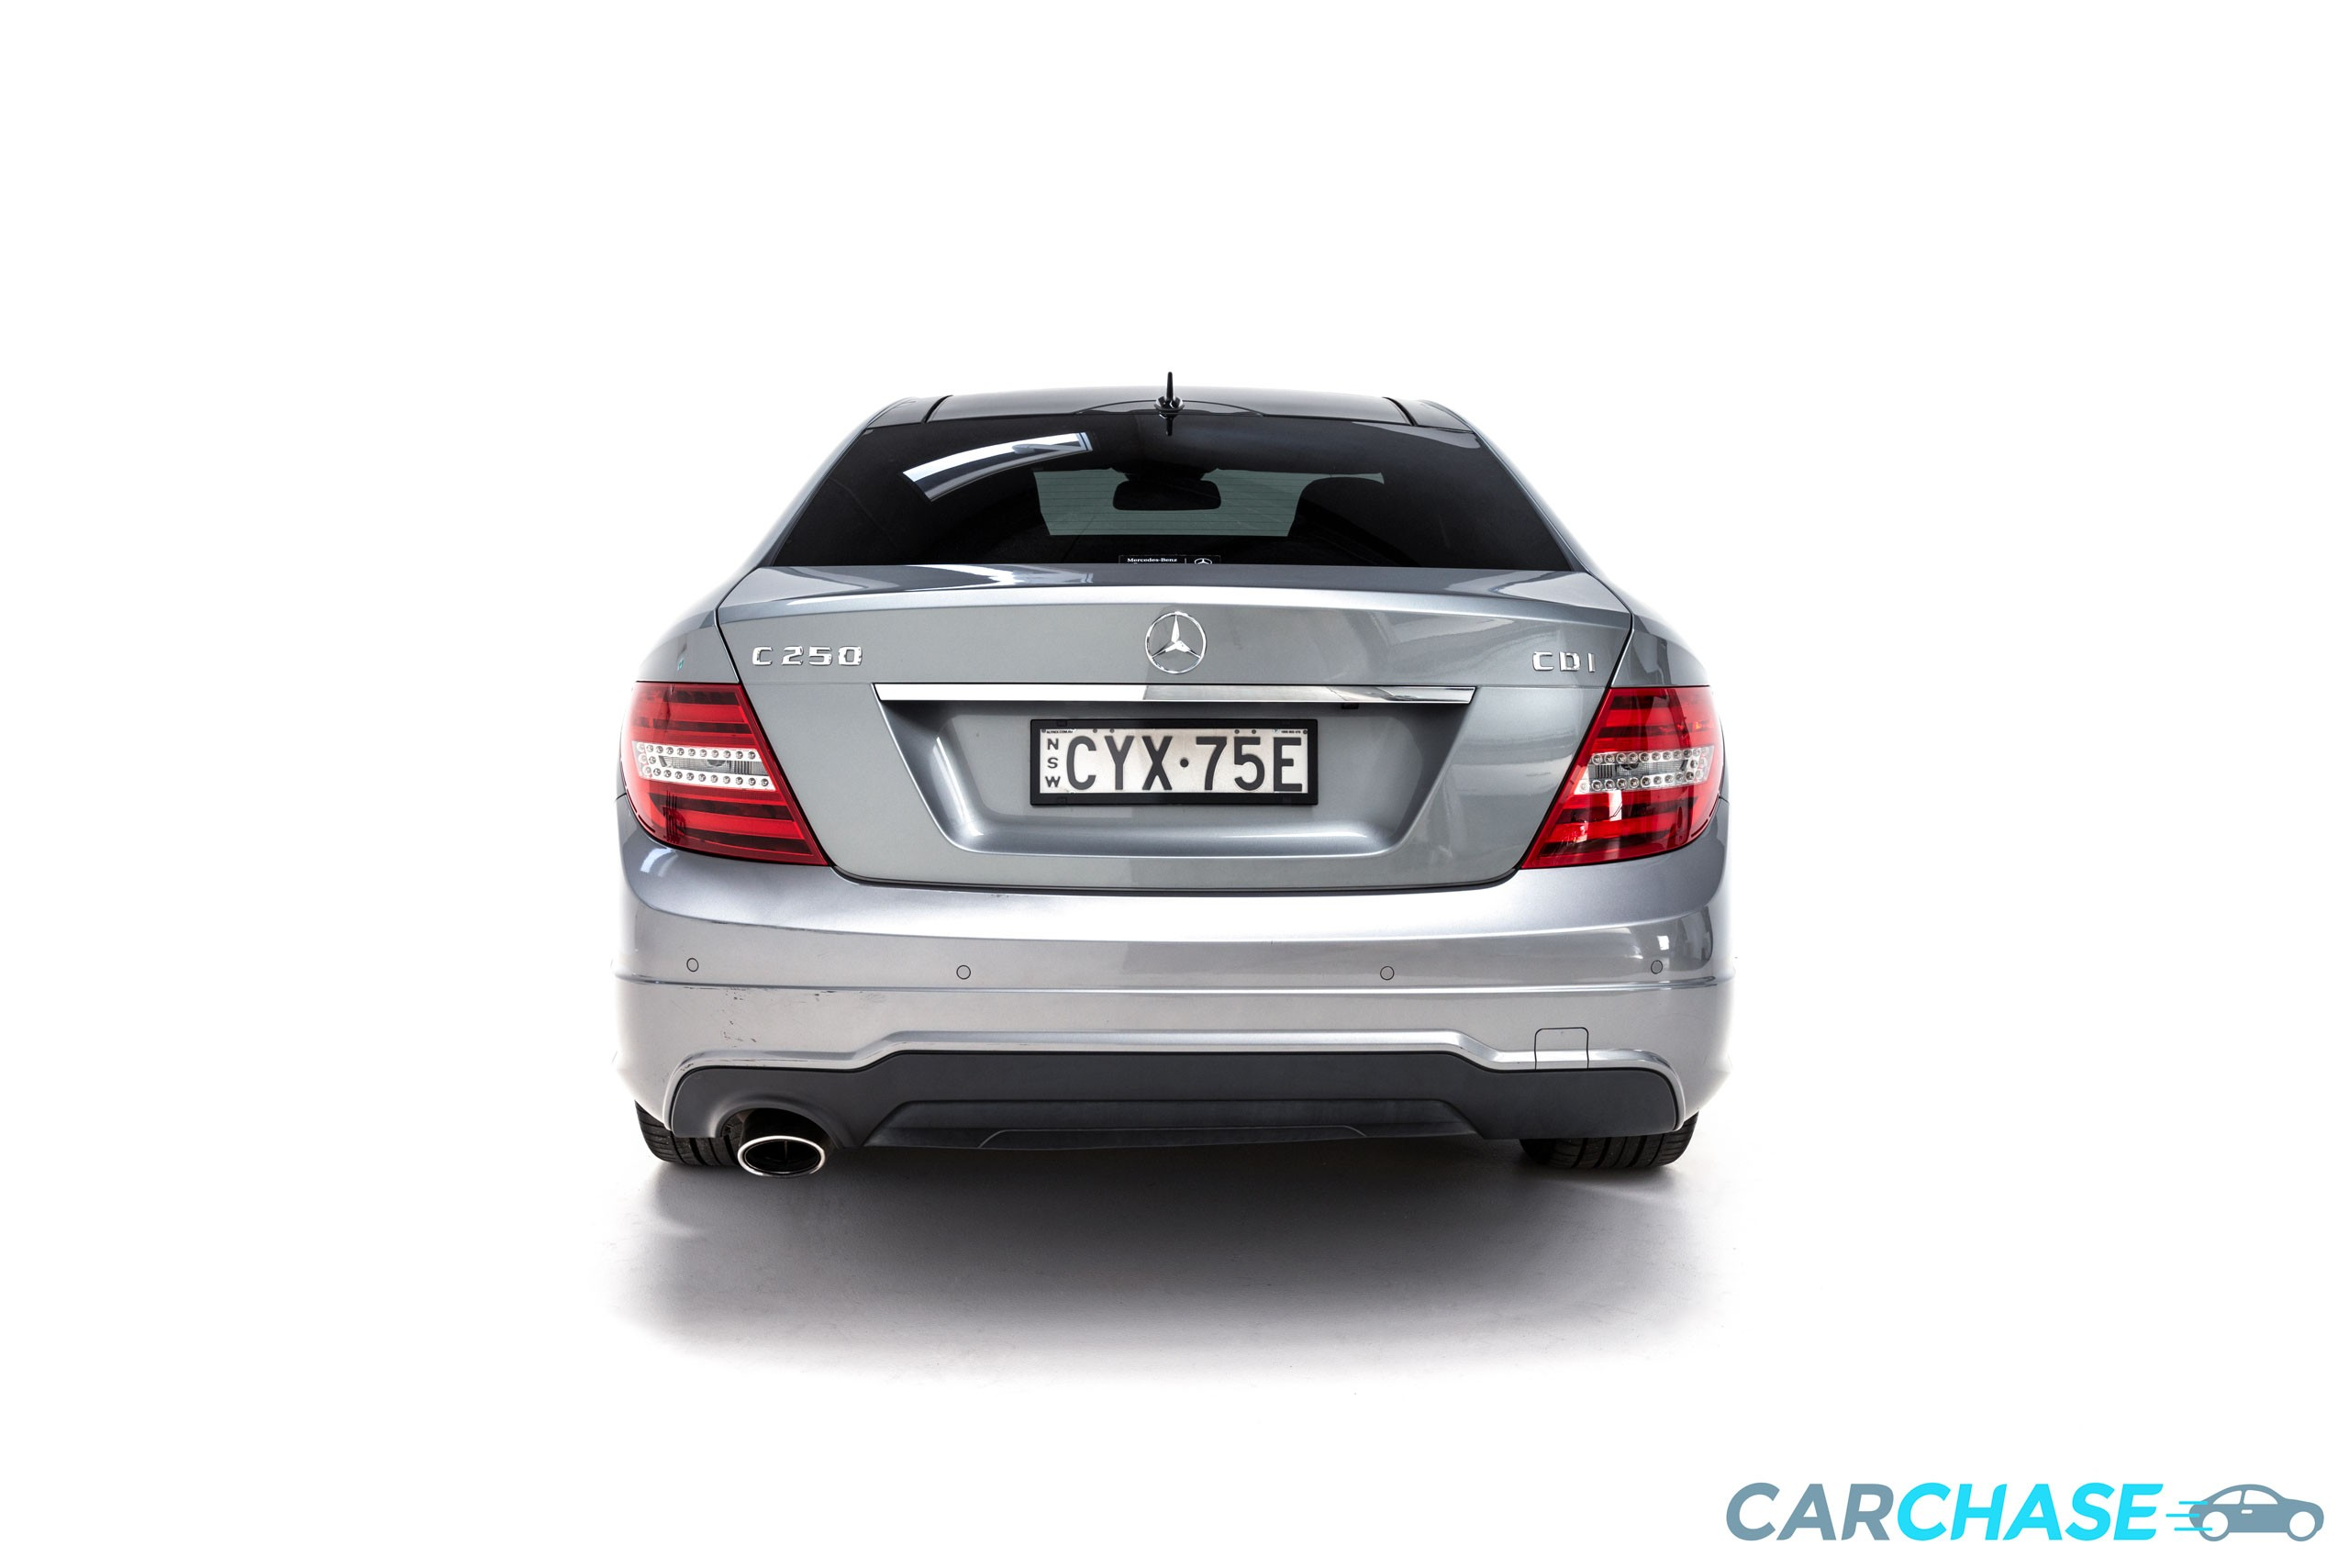 Image of rear profile of 2015 Mercedes-Benz C250 CDi Avantgarde